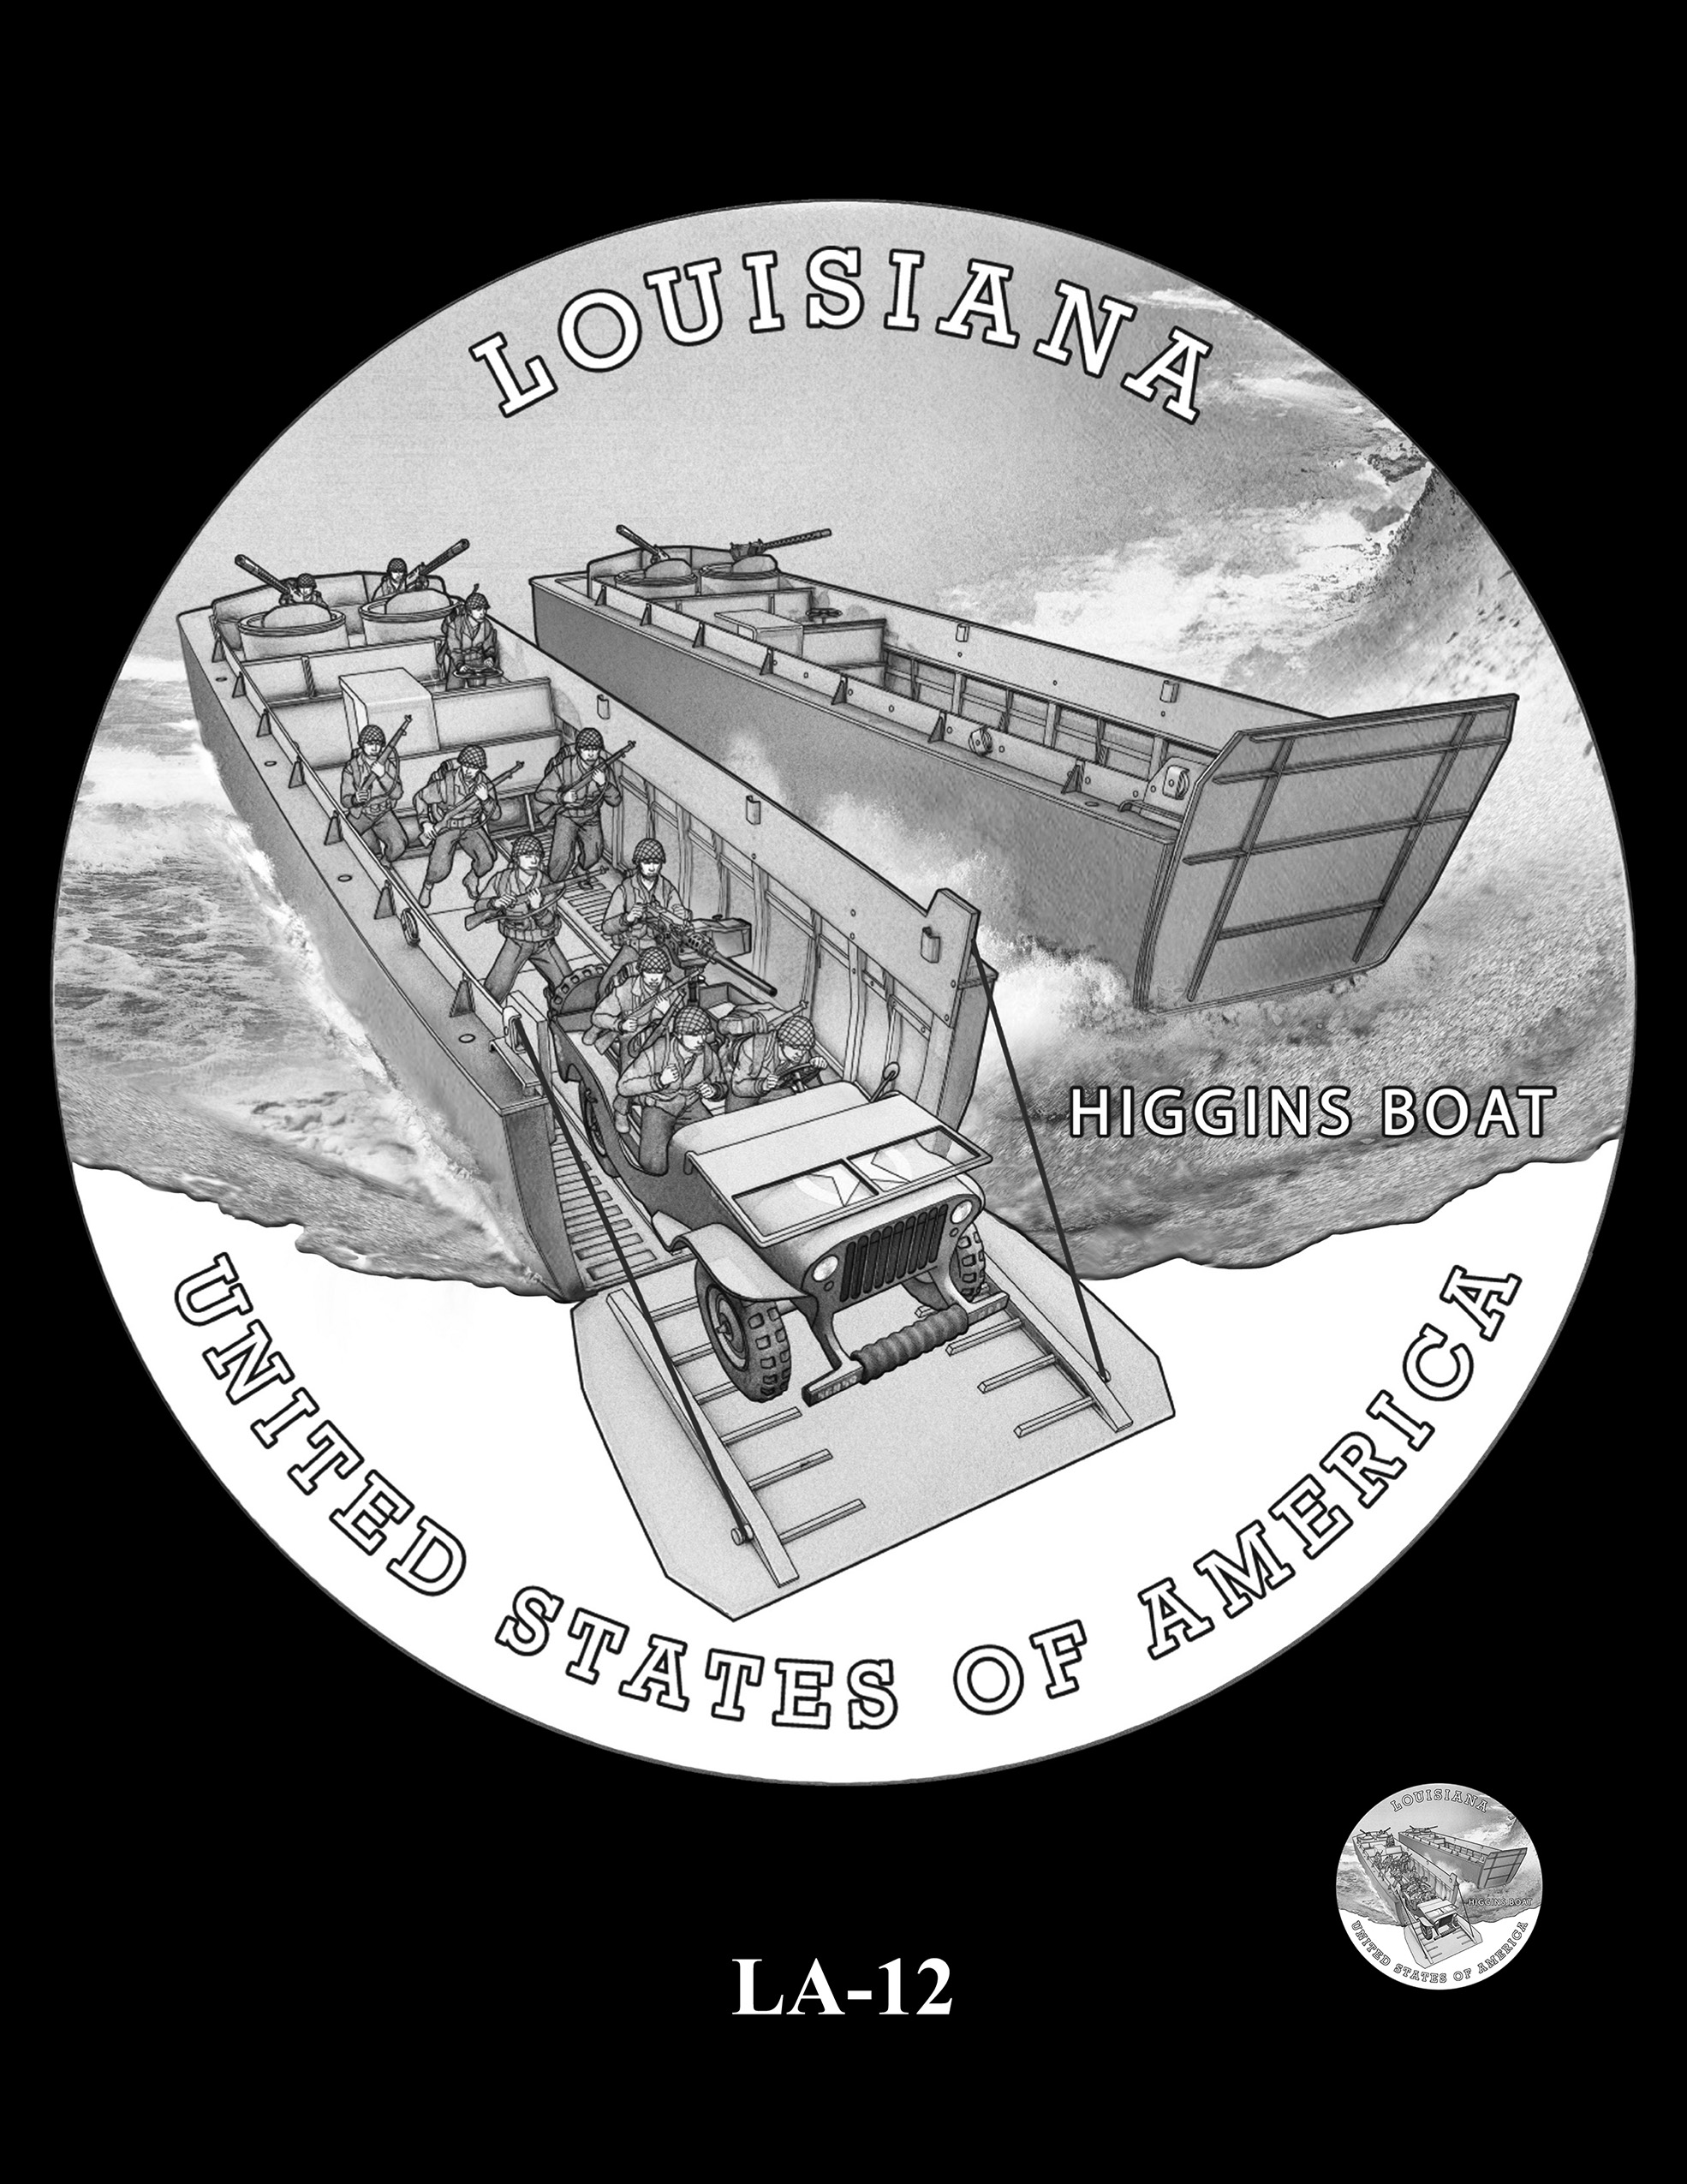 LA-12 -- 2023 American Innovation $1 Coin Program - Louisiana